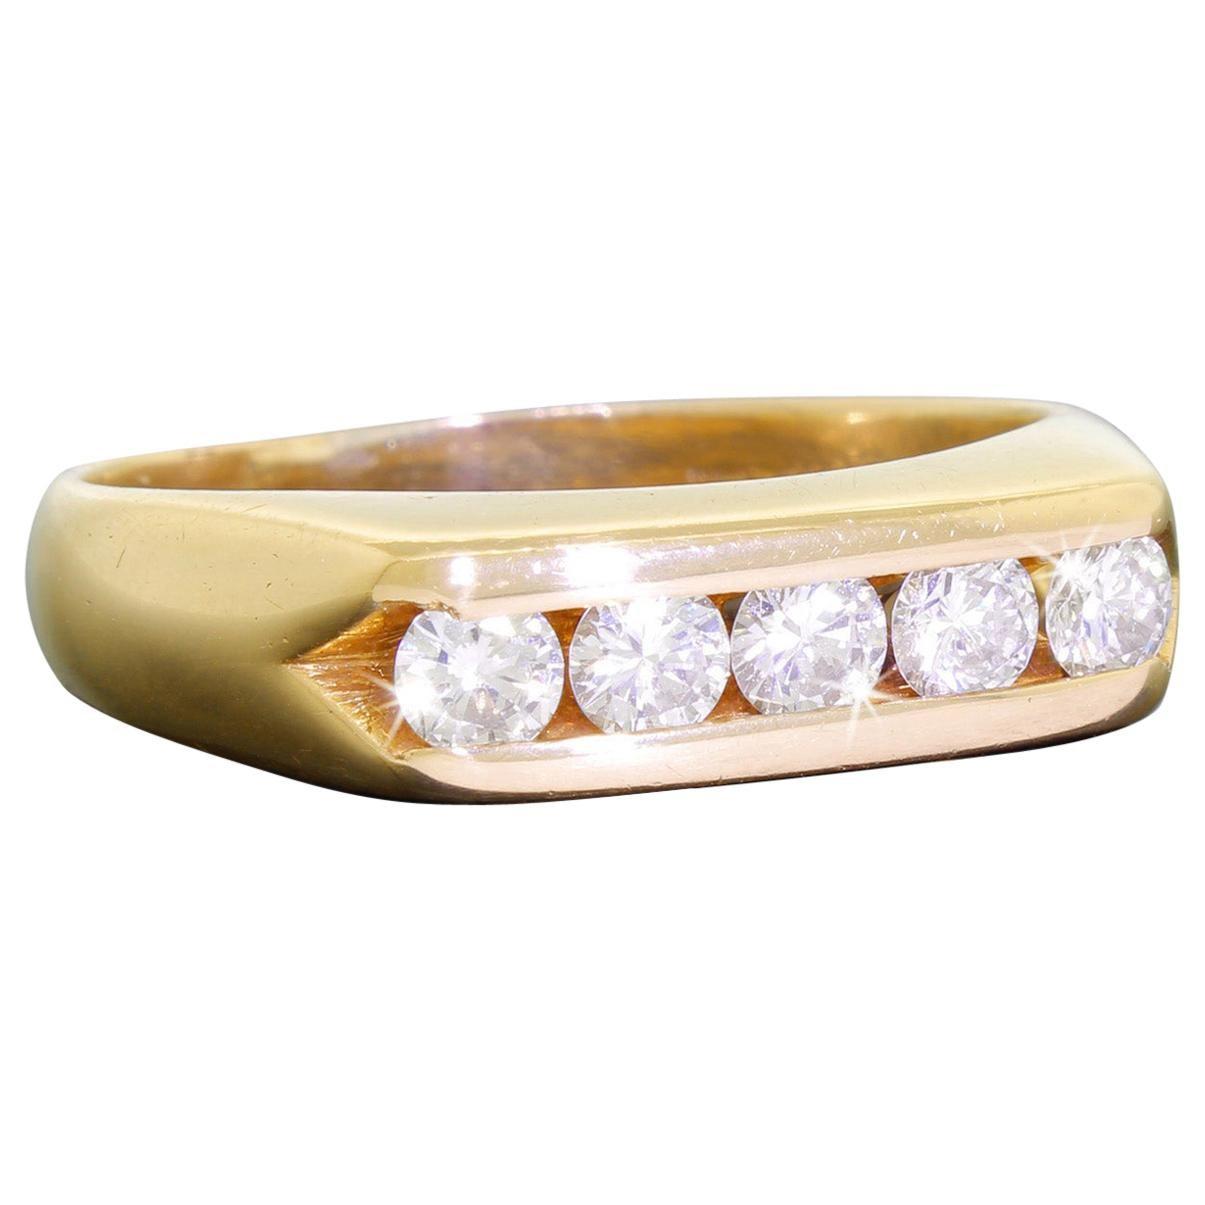 Artcarved Men's 14 Karat Gold Band Ring with 5 Quality Diamonds 0.75 Carat